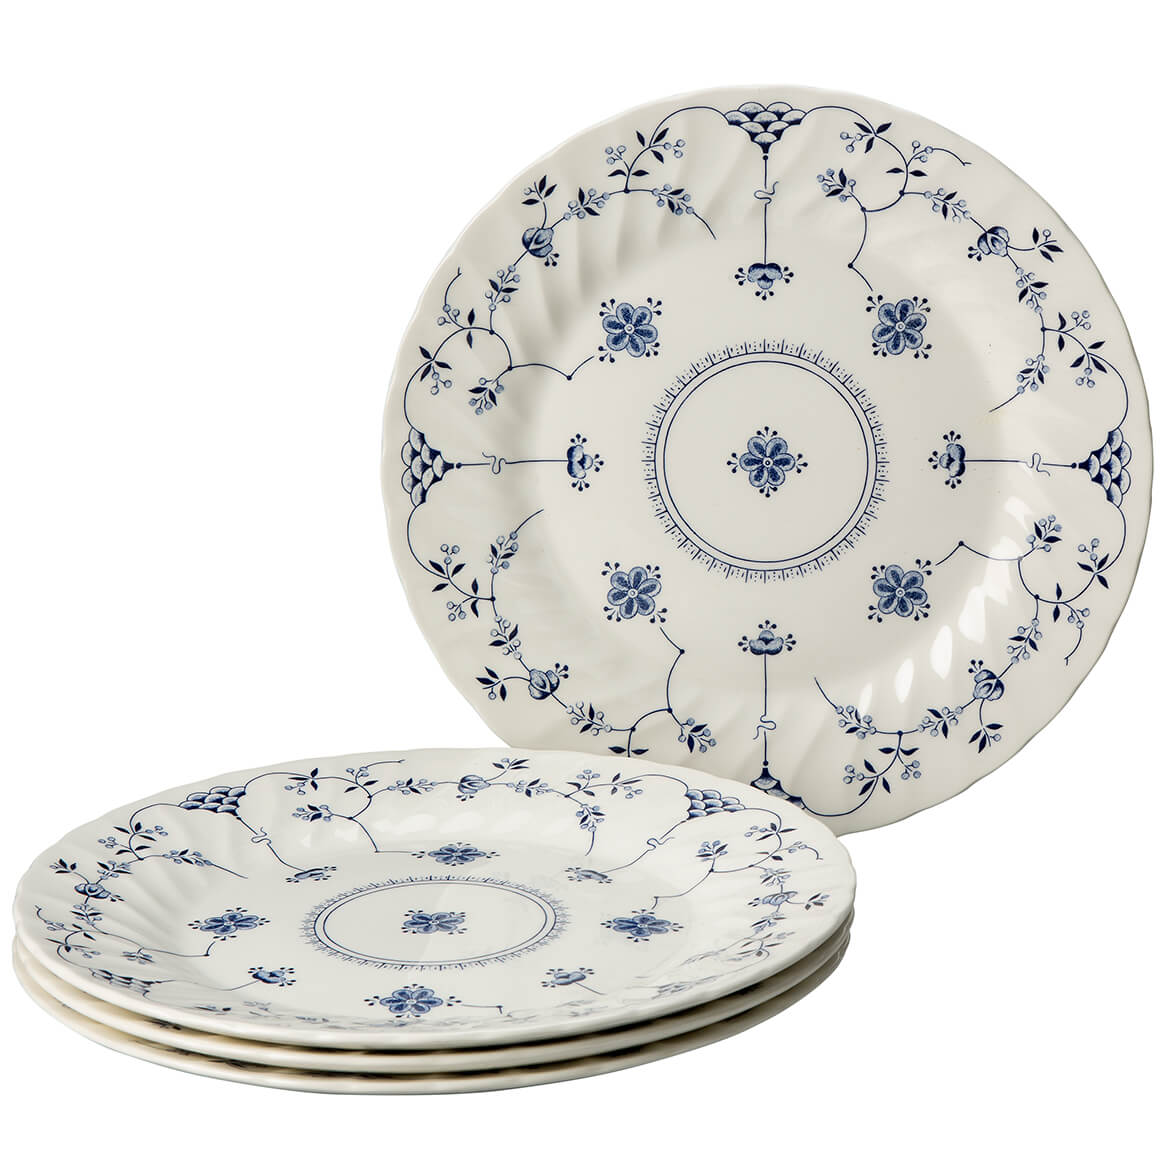 Finlandia Set of 4 Dinner Plates-368567